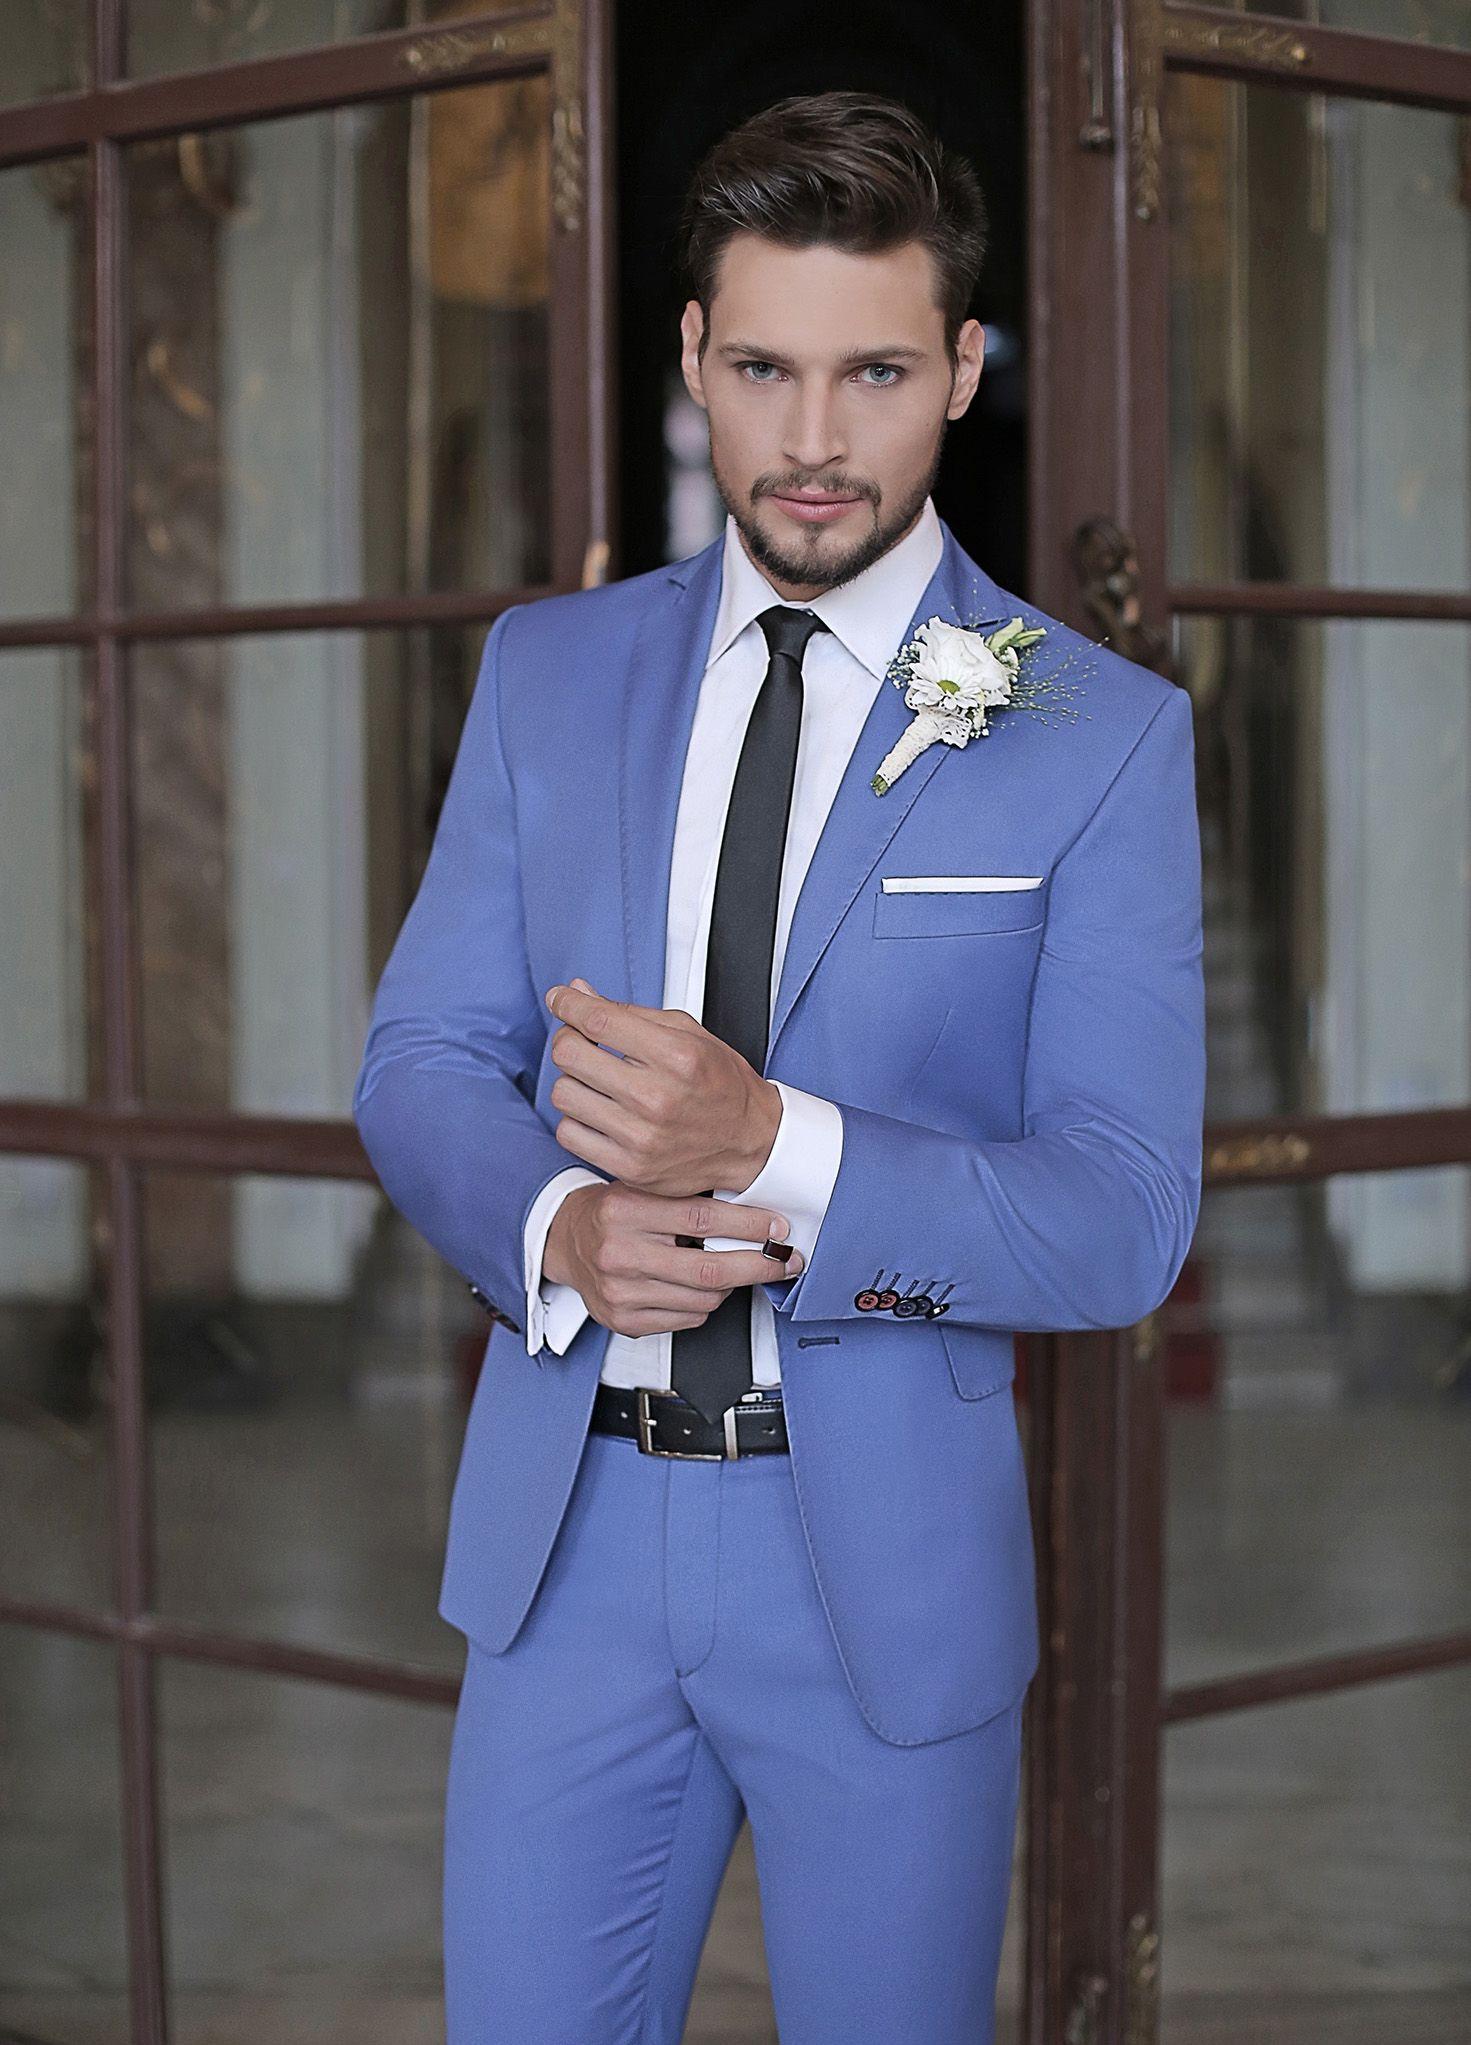 Lookbook Slubny 2016 Blue Suit Wedding Wedding Suits Men Prom Suits For Men